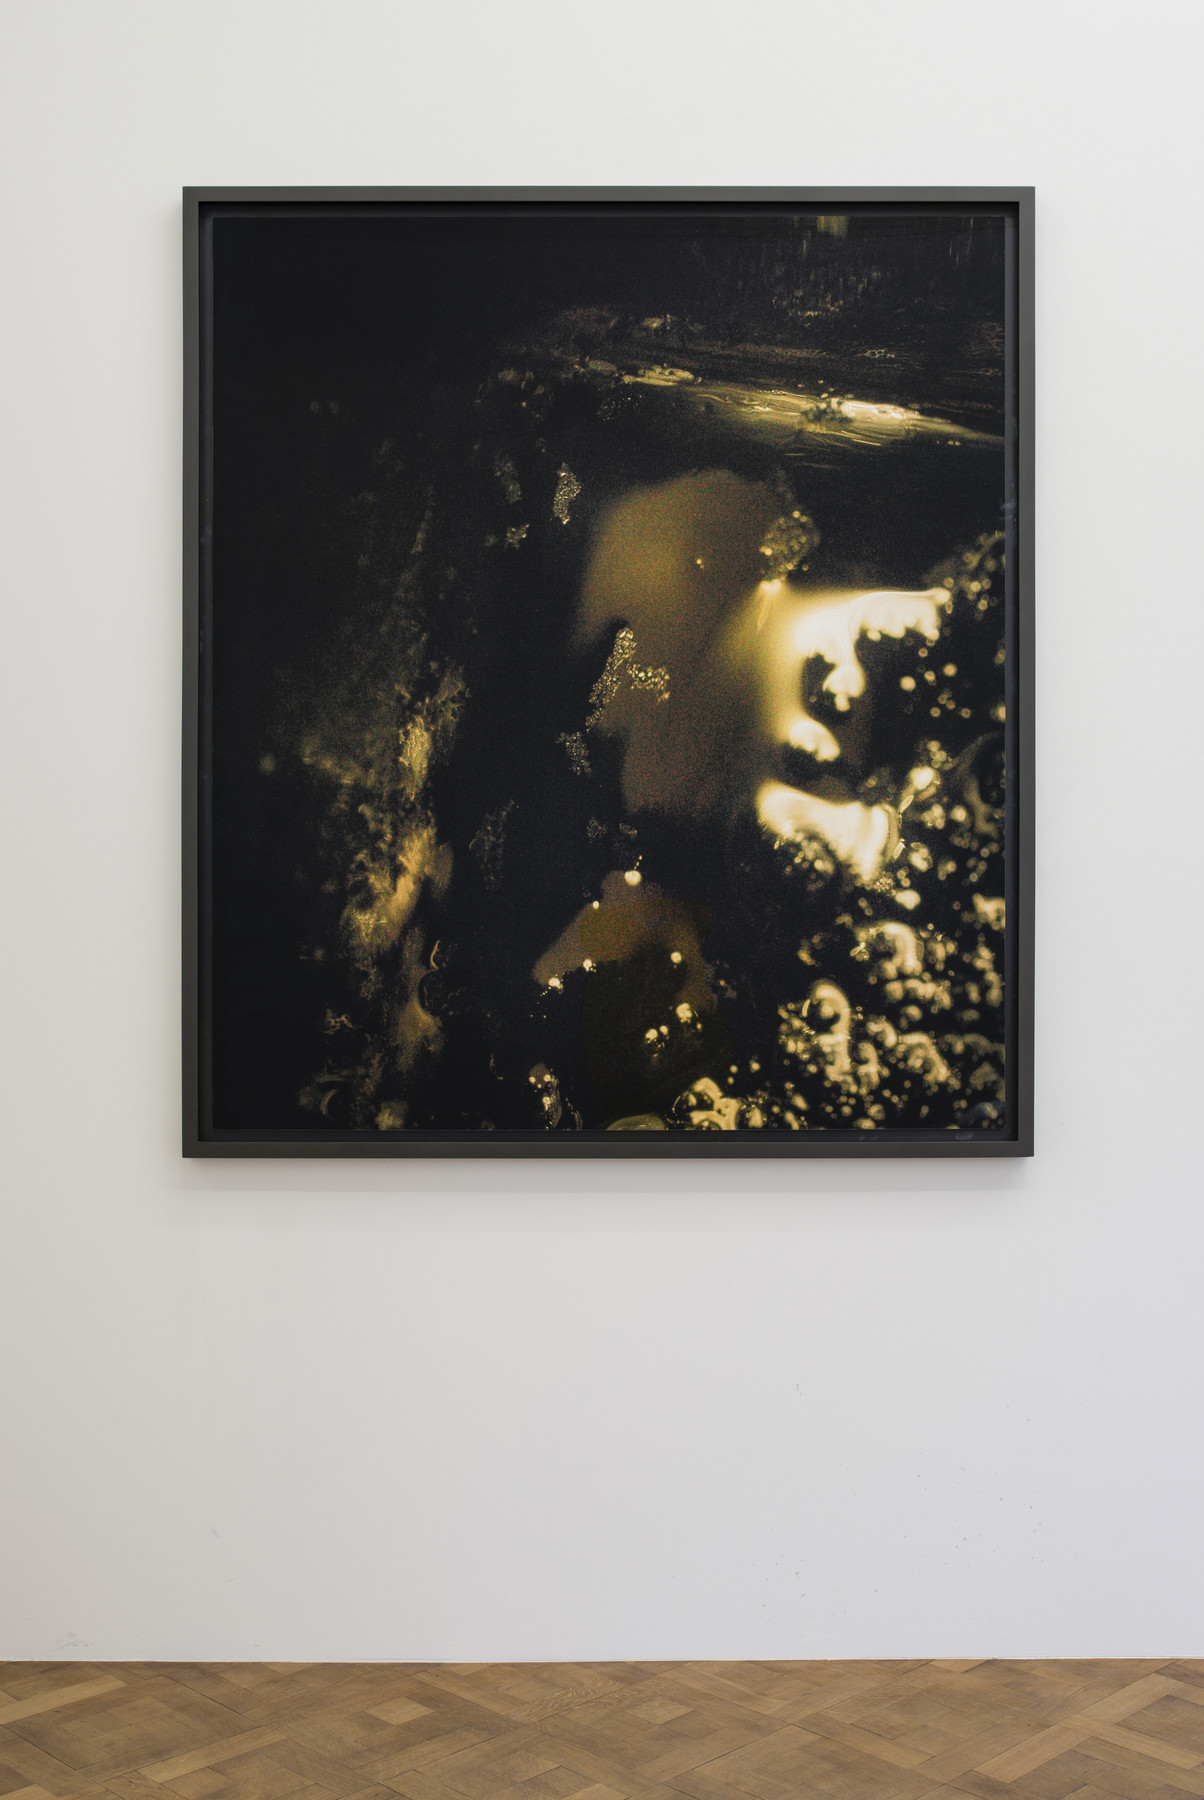 Melik Ohanian, Portrait of Duration — Cesium Series II T0174, 2016, Color photograph mounted on aluminium, 173 x 150 x 5cm (framed), 1_1 + 1 AP